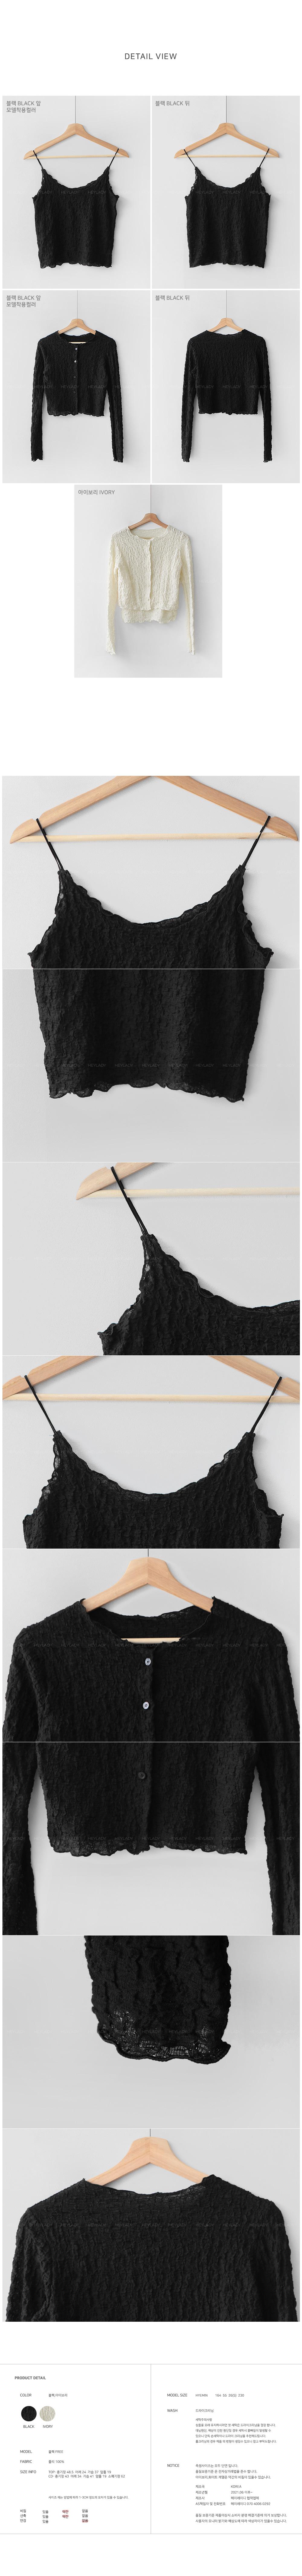 Velun Sleeveless Cardigan Set